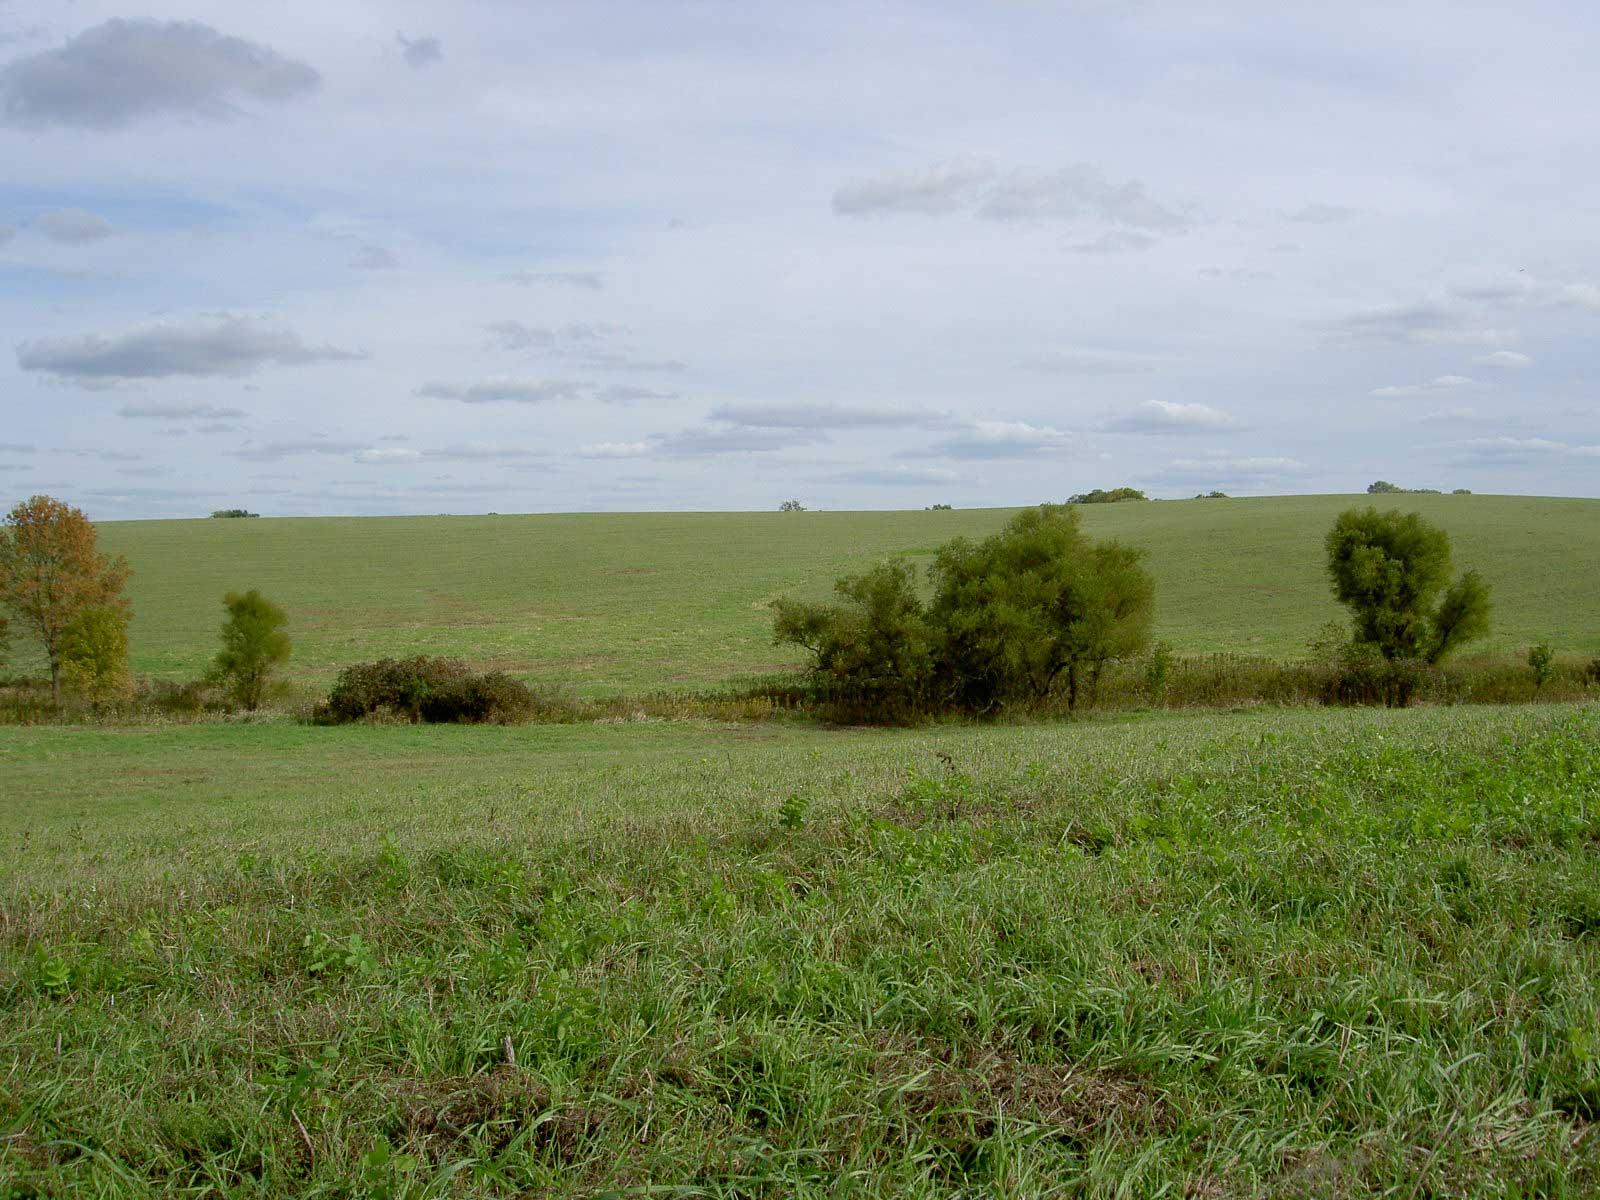 Between Corydon and Highpoint, Iowa